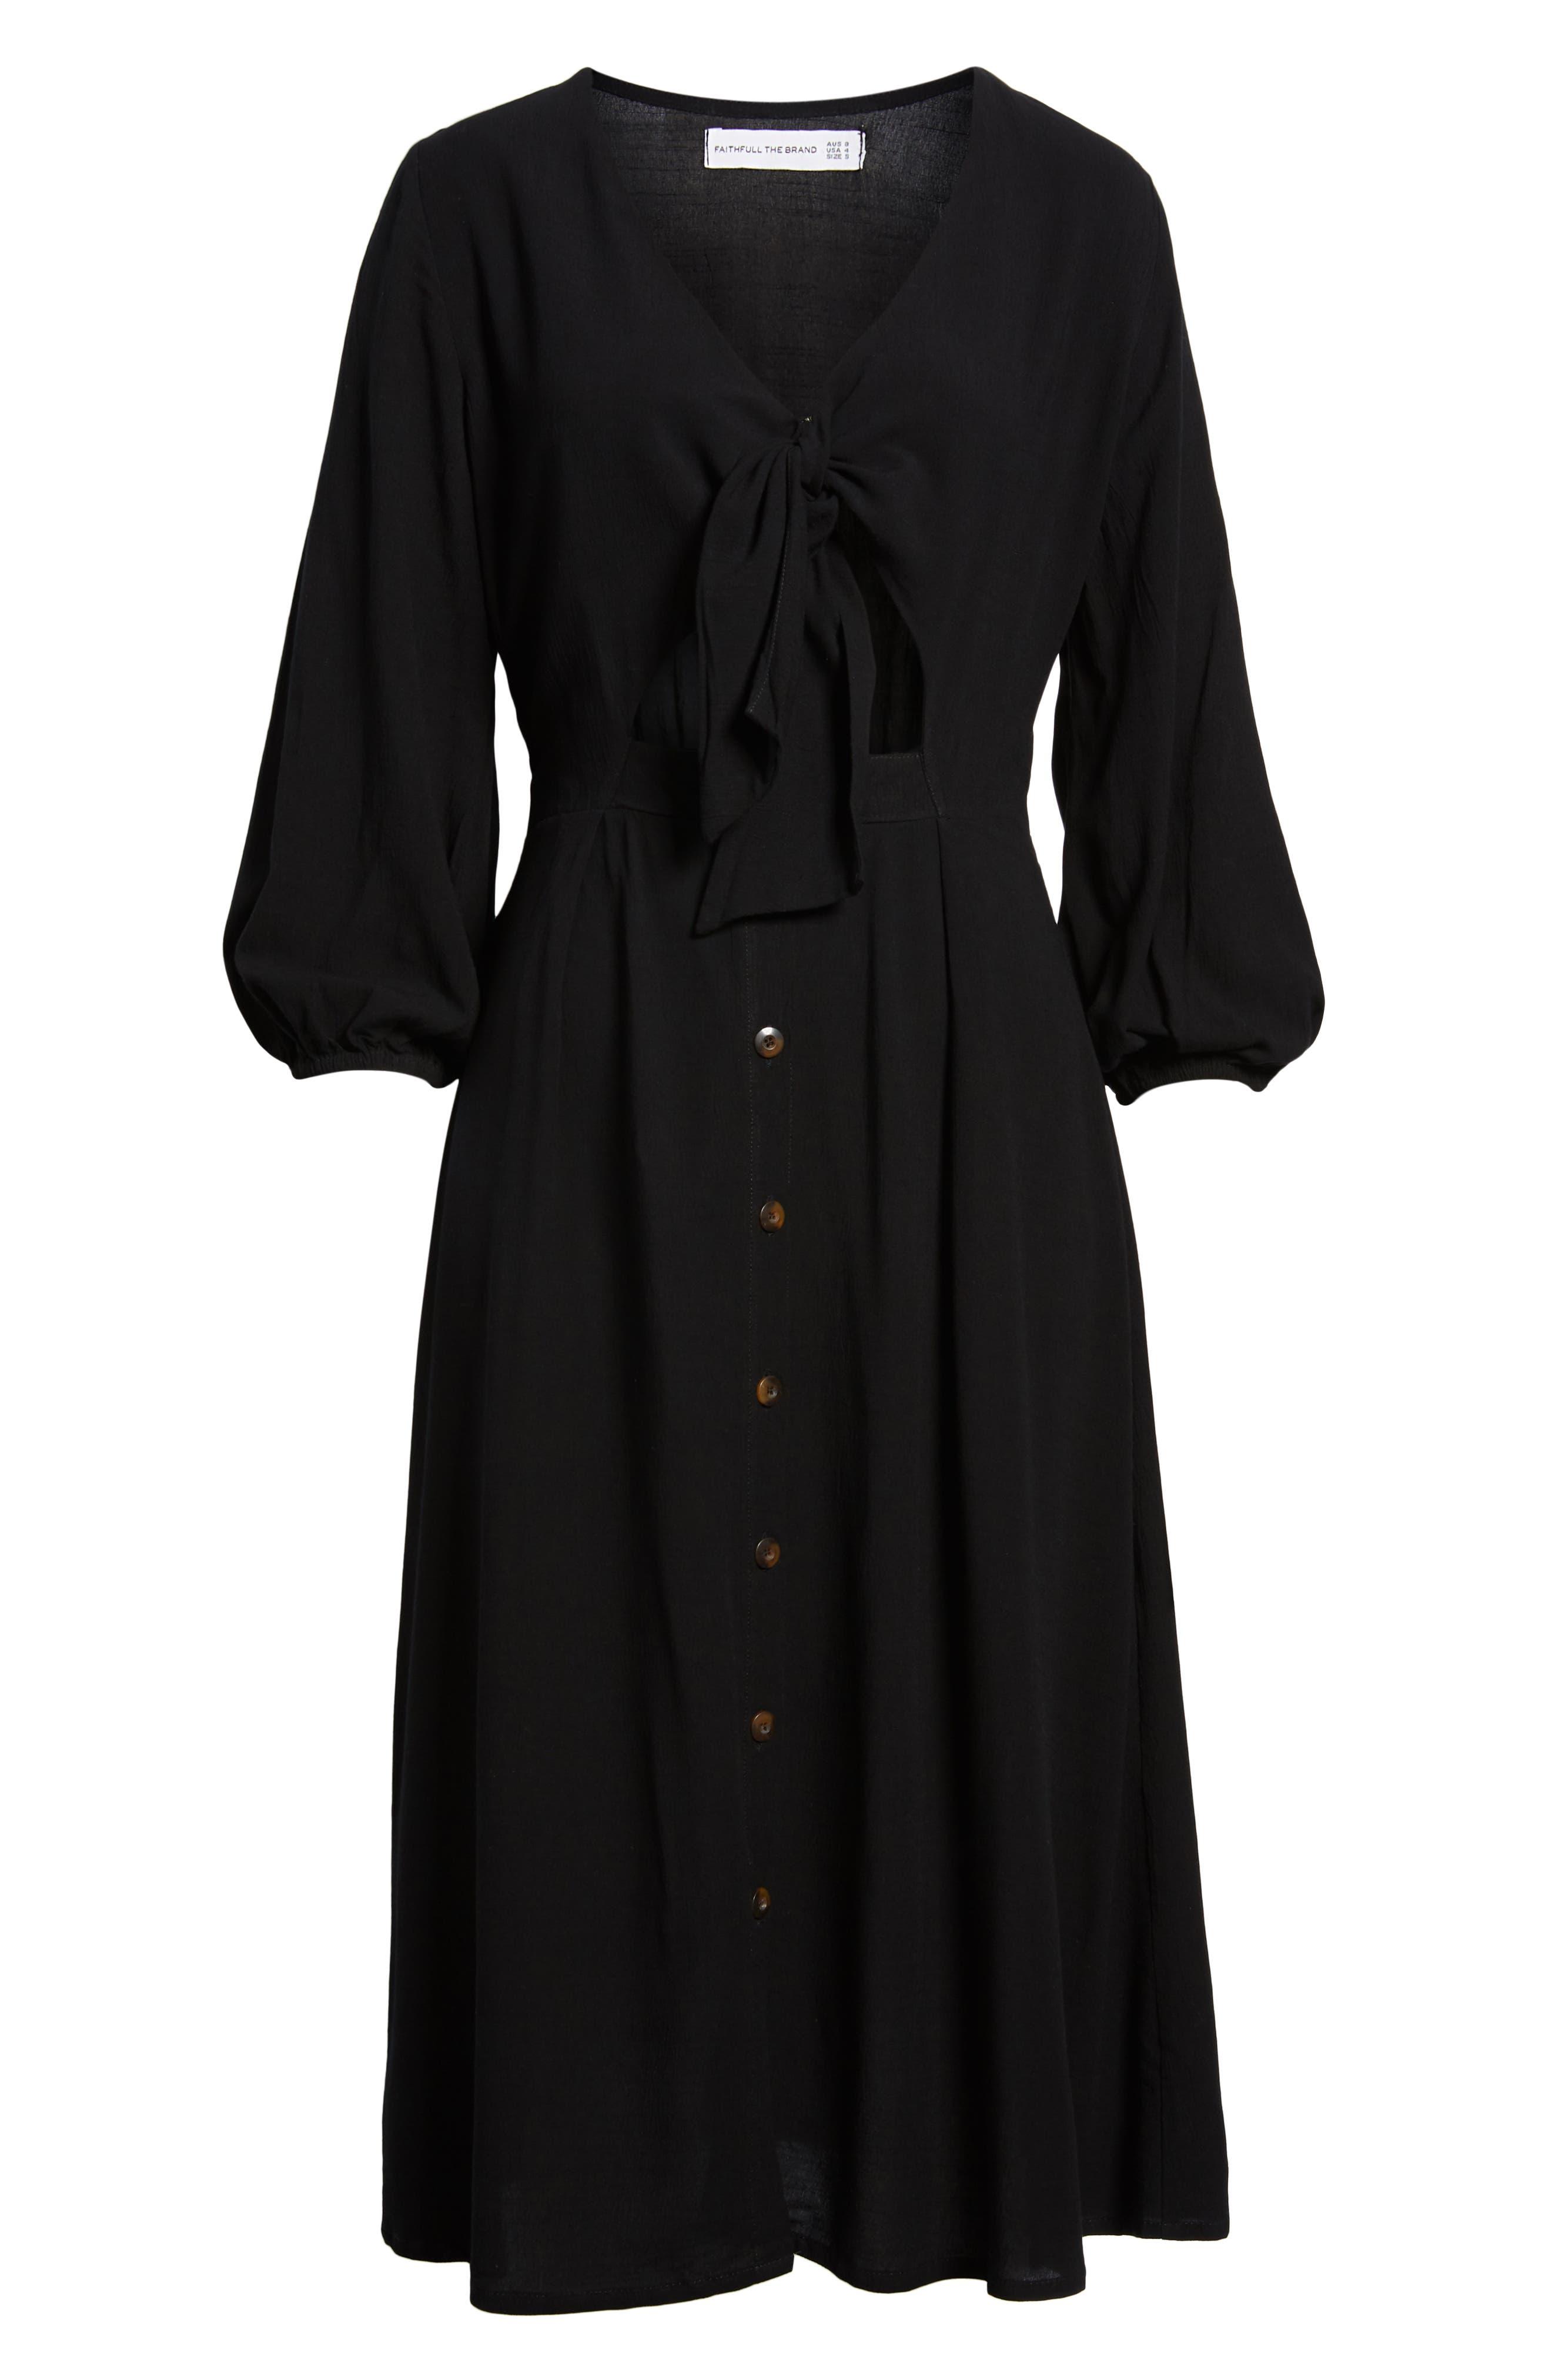 Tobago Tie Front Midi Dress,                             Alternate thumbnail 4, color,                             PLAIN BLACK